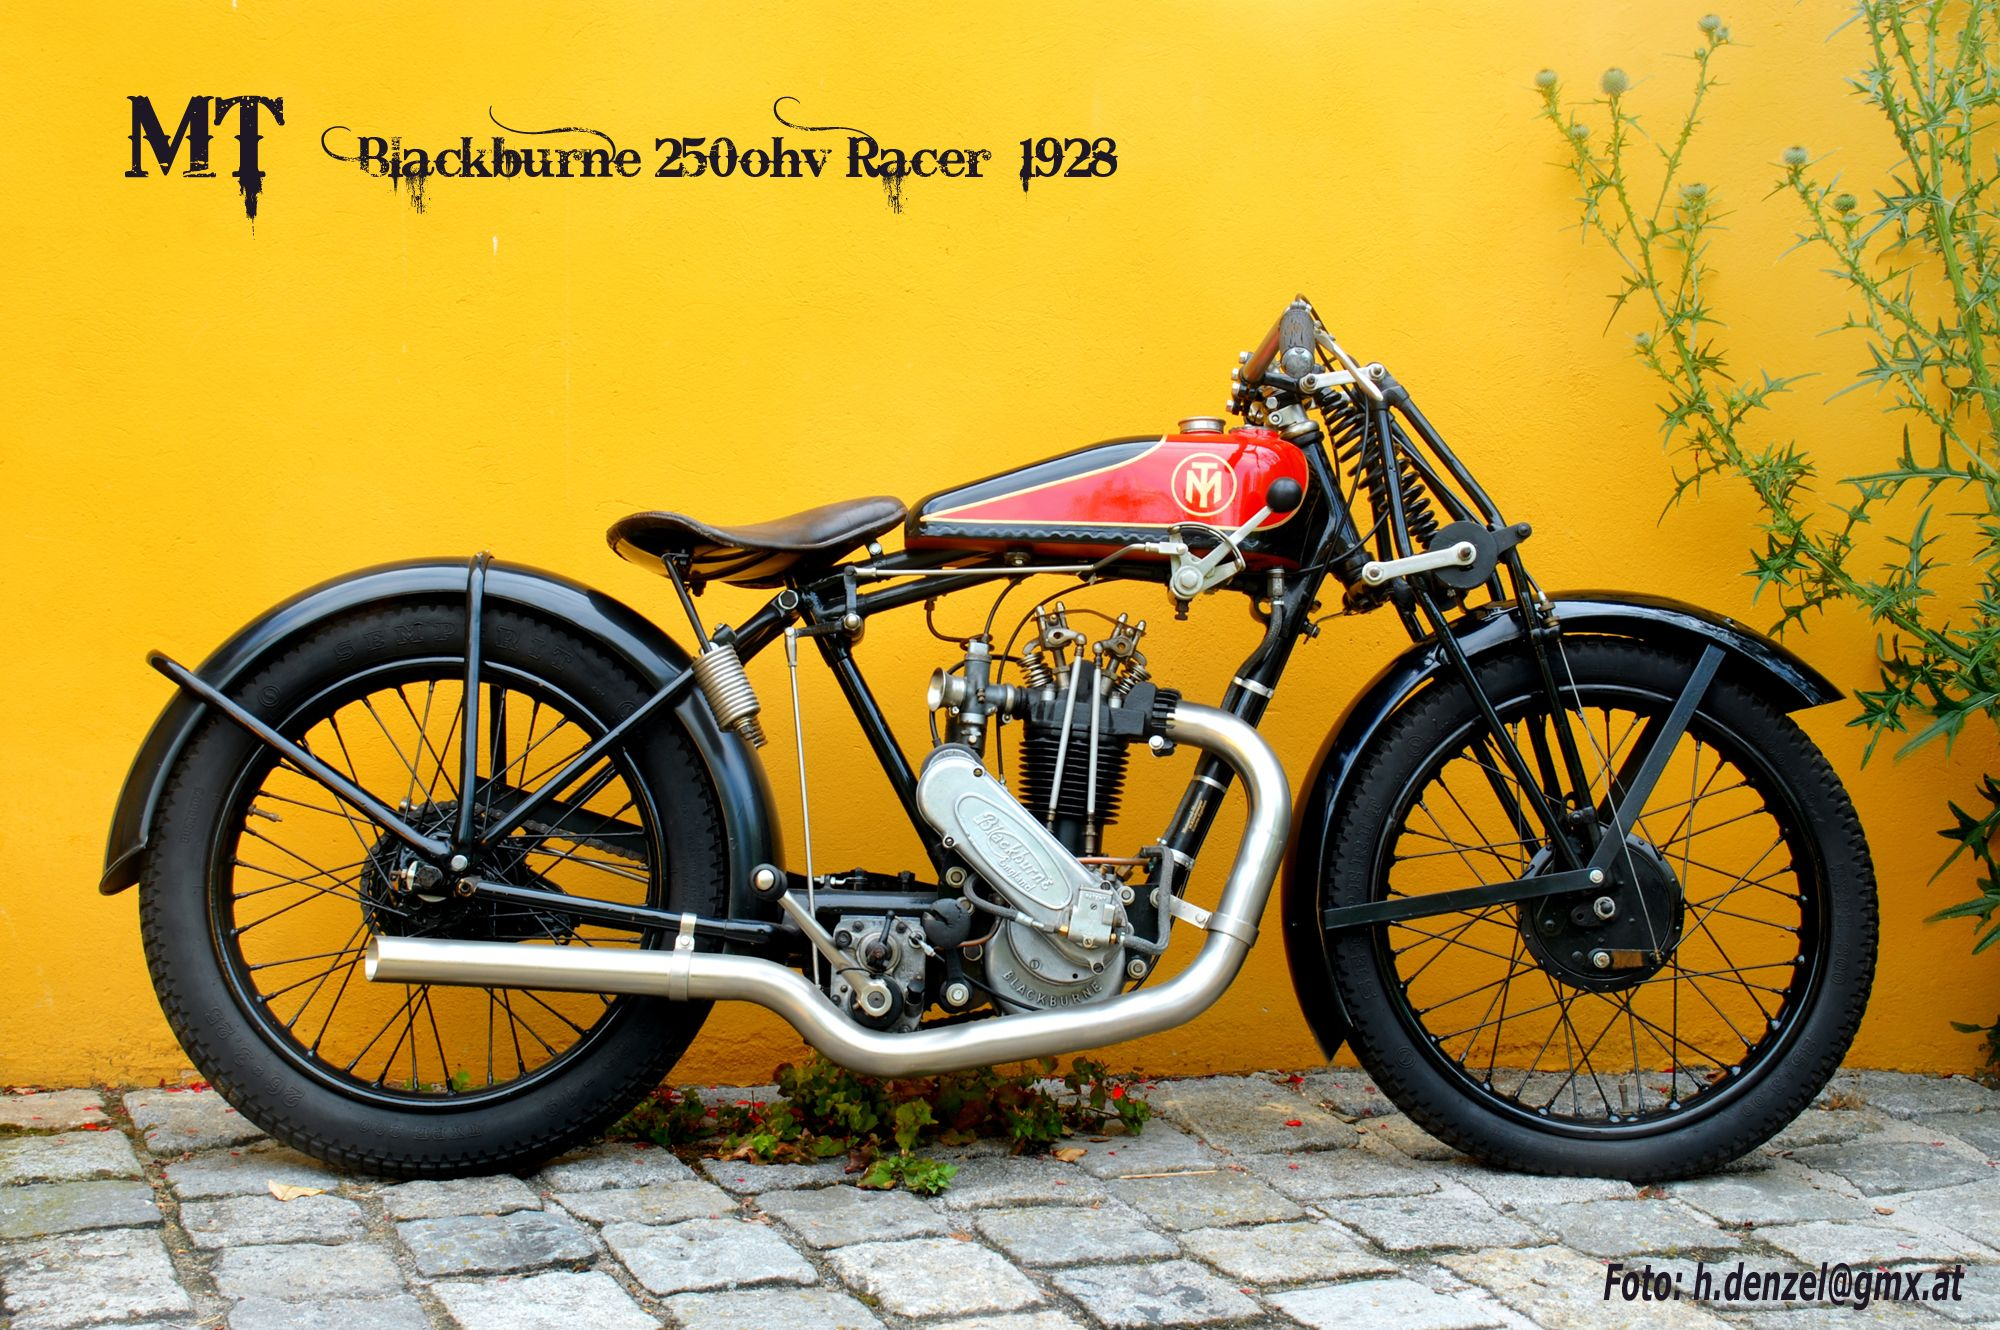 MT 250ohv Blackburne Racer 1928